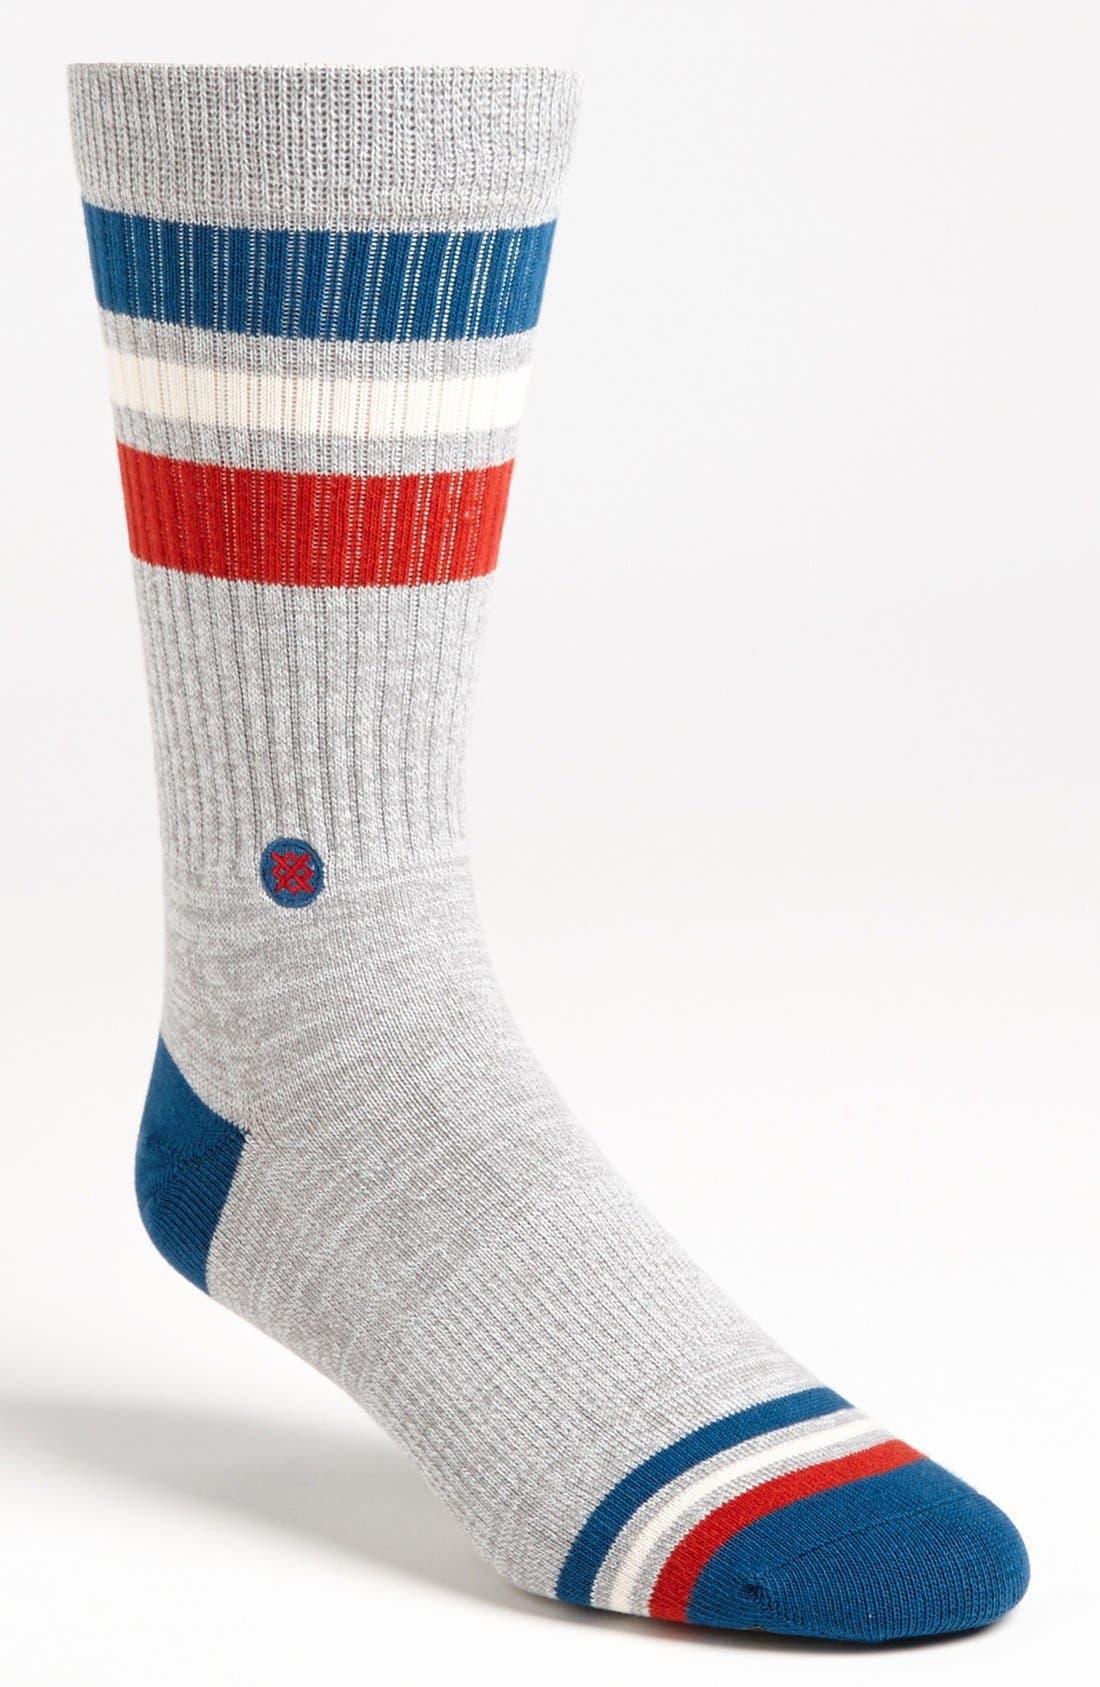 Alternate Image 1 Selected - Stance 'Garfield' Socks